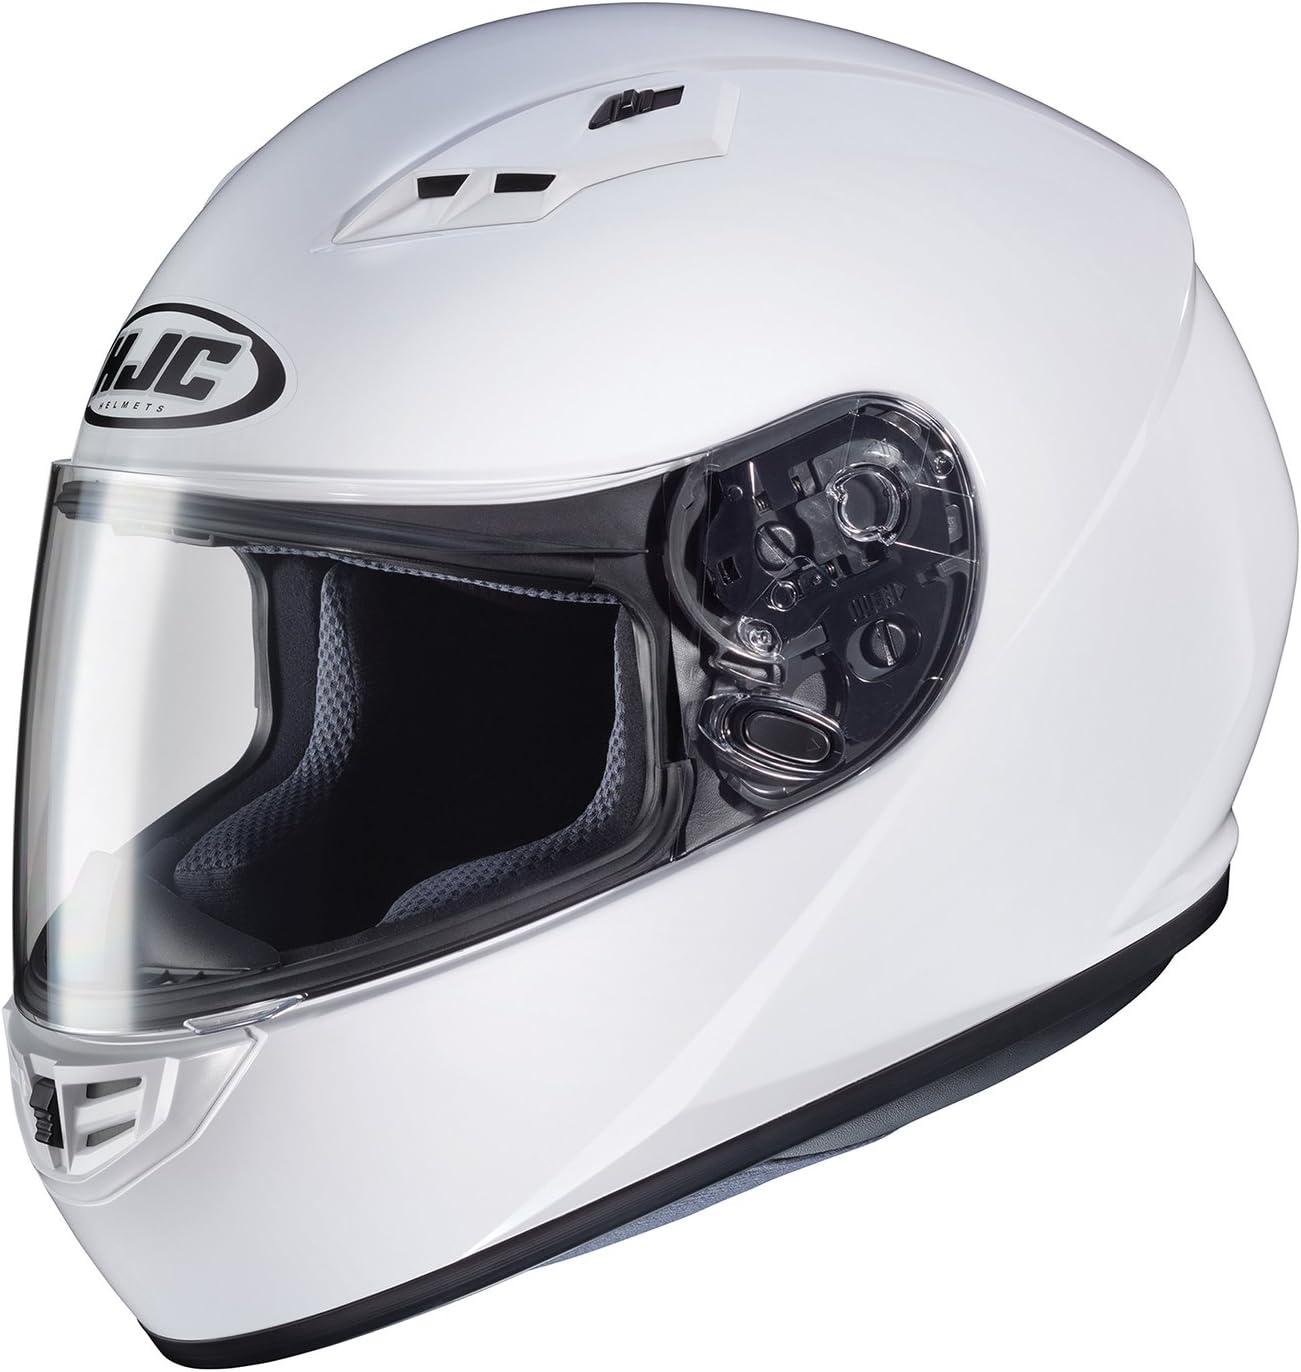 HJC Helmets CS-R3 Unisex-Adult Full Face Solid Motorcycle Helmet White, Medium